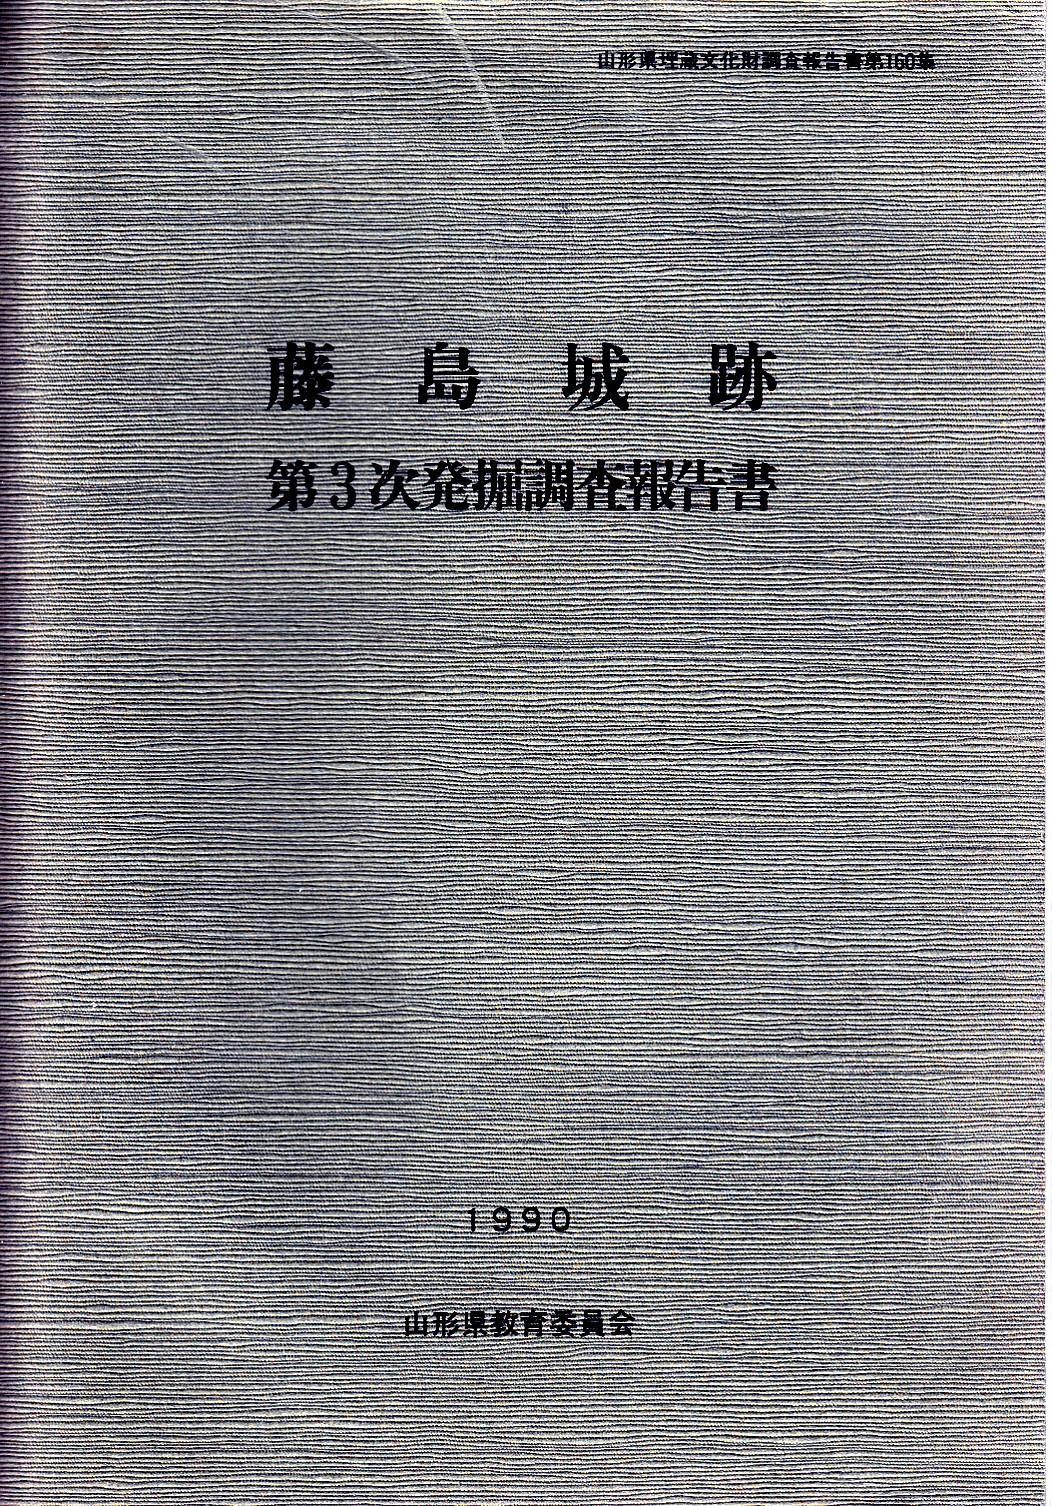 No-0274